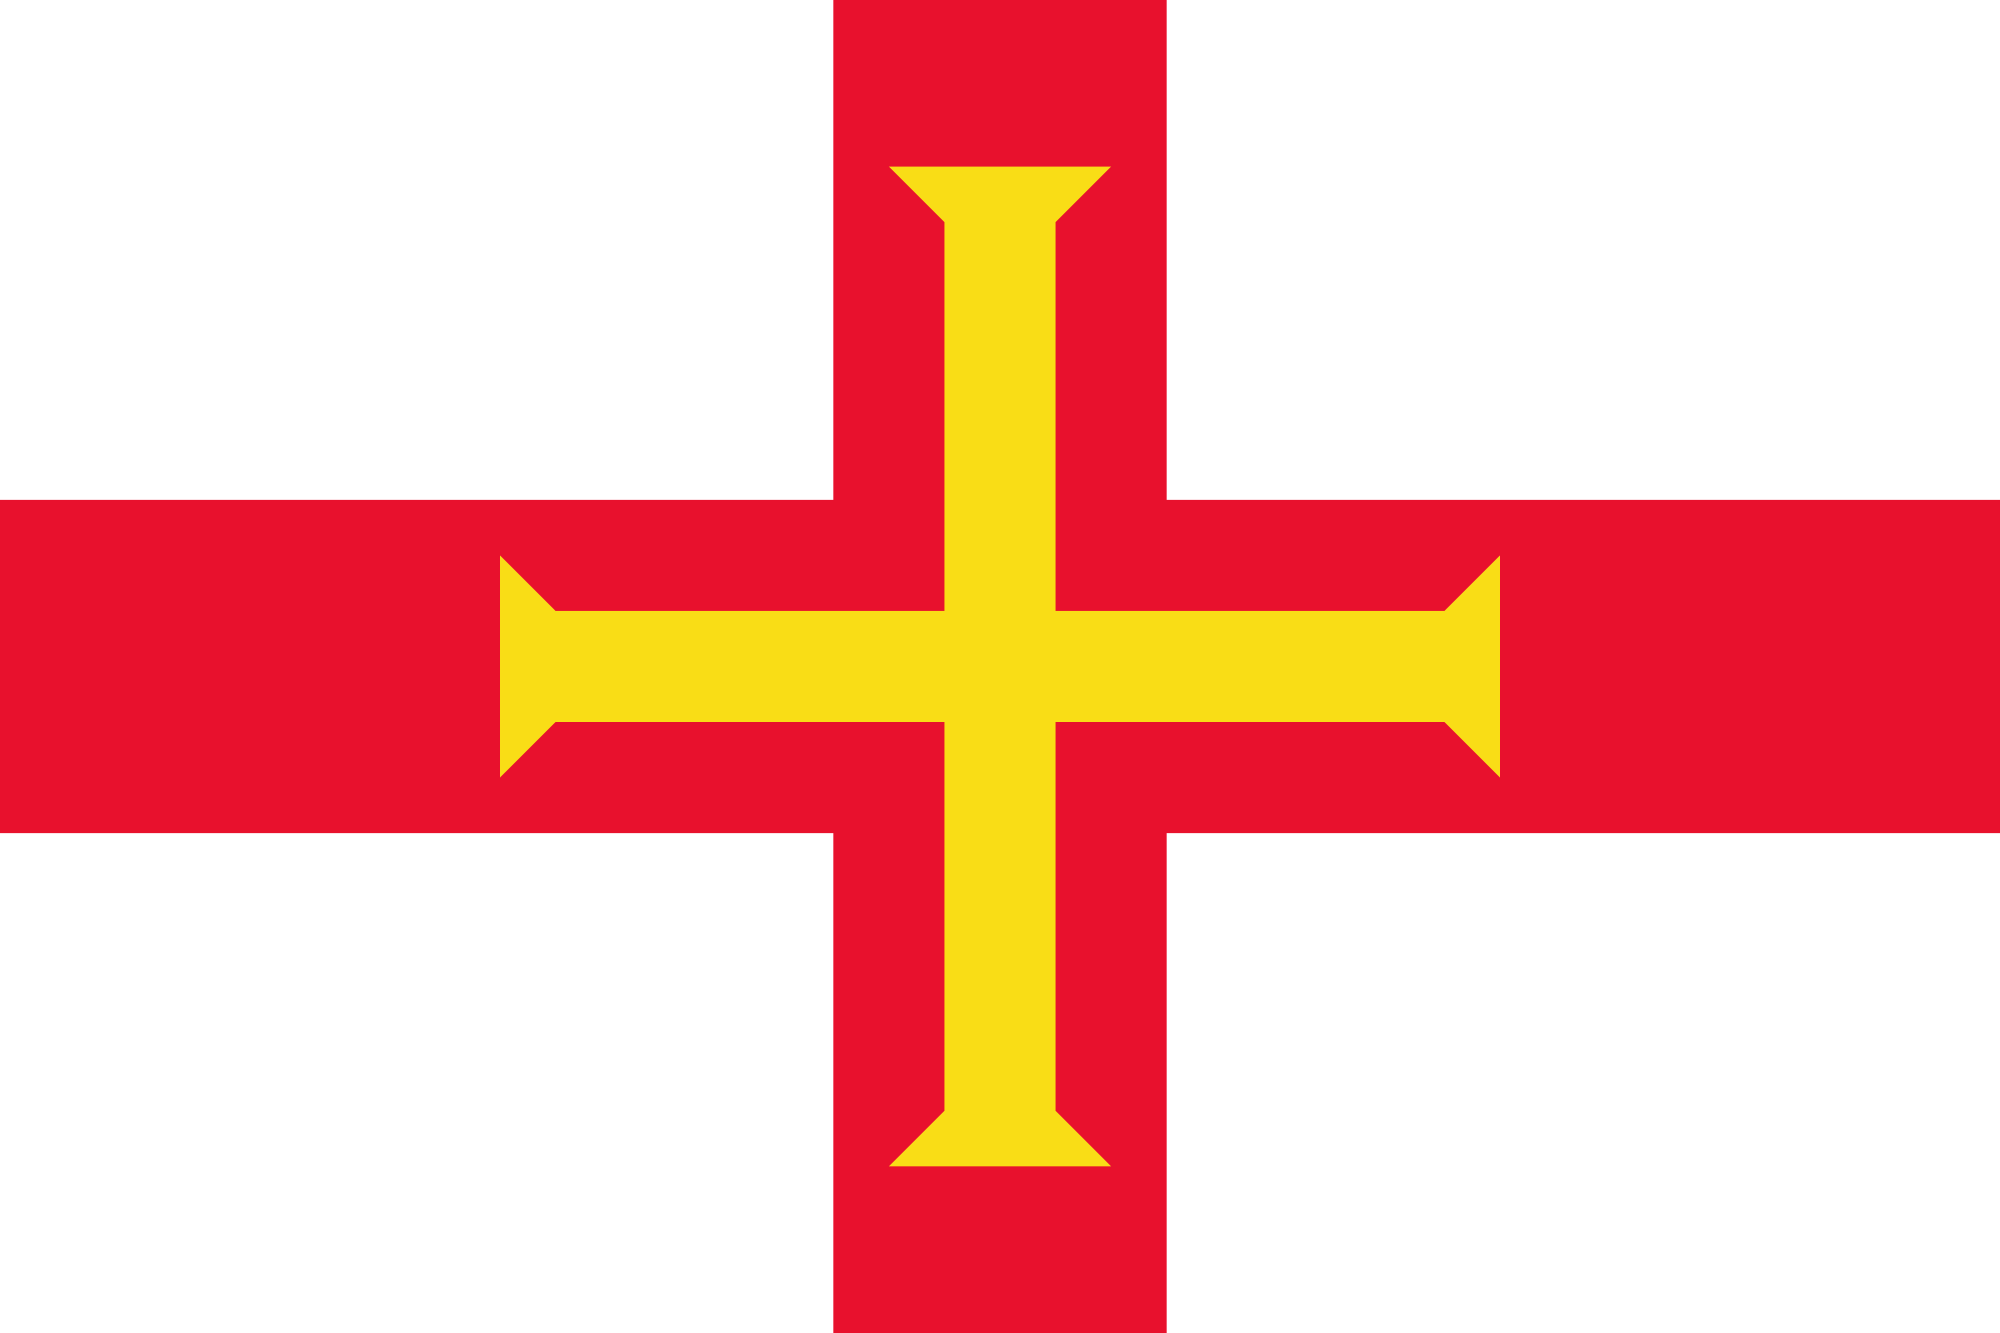 Guernsey, Land, Emblem, Logo, Symbol - Wallpaper HD - Prof.-falken.com